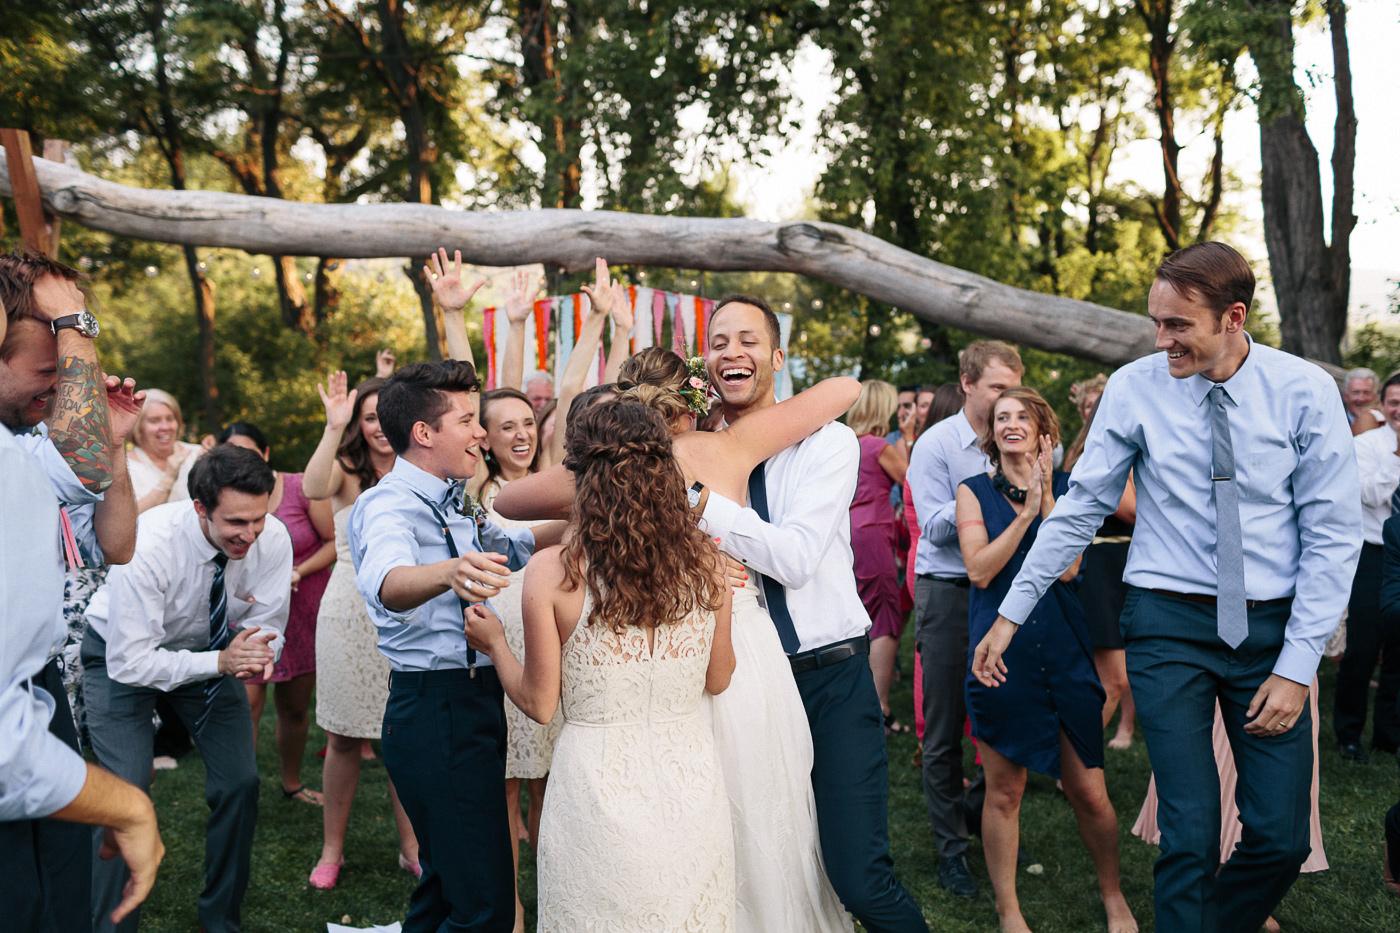 Lyons-Farmette-Wedding-Photographer-Lucy-Austin-Flash-Mob-Dance-54.jpg